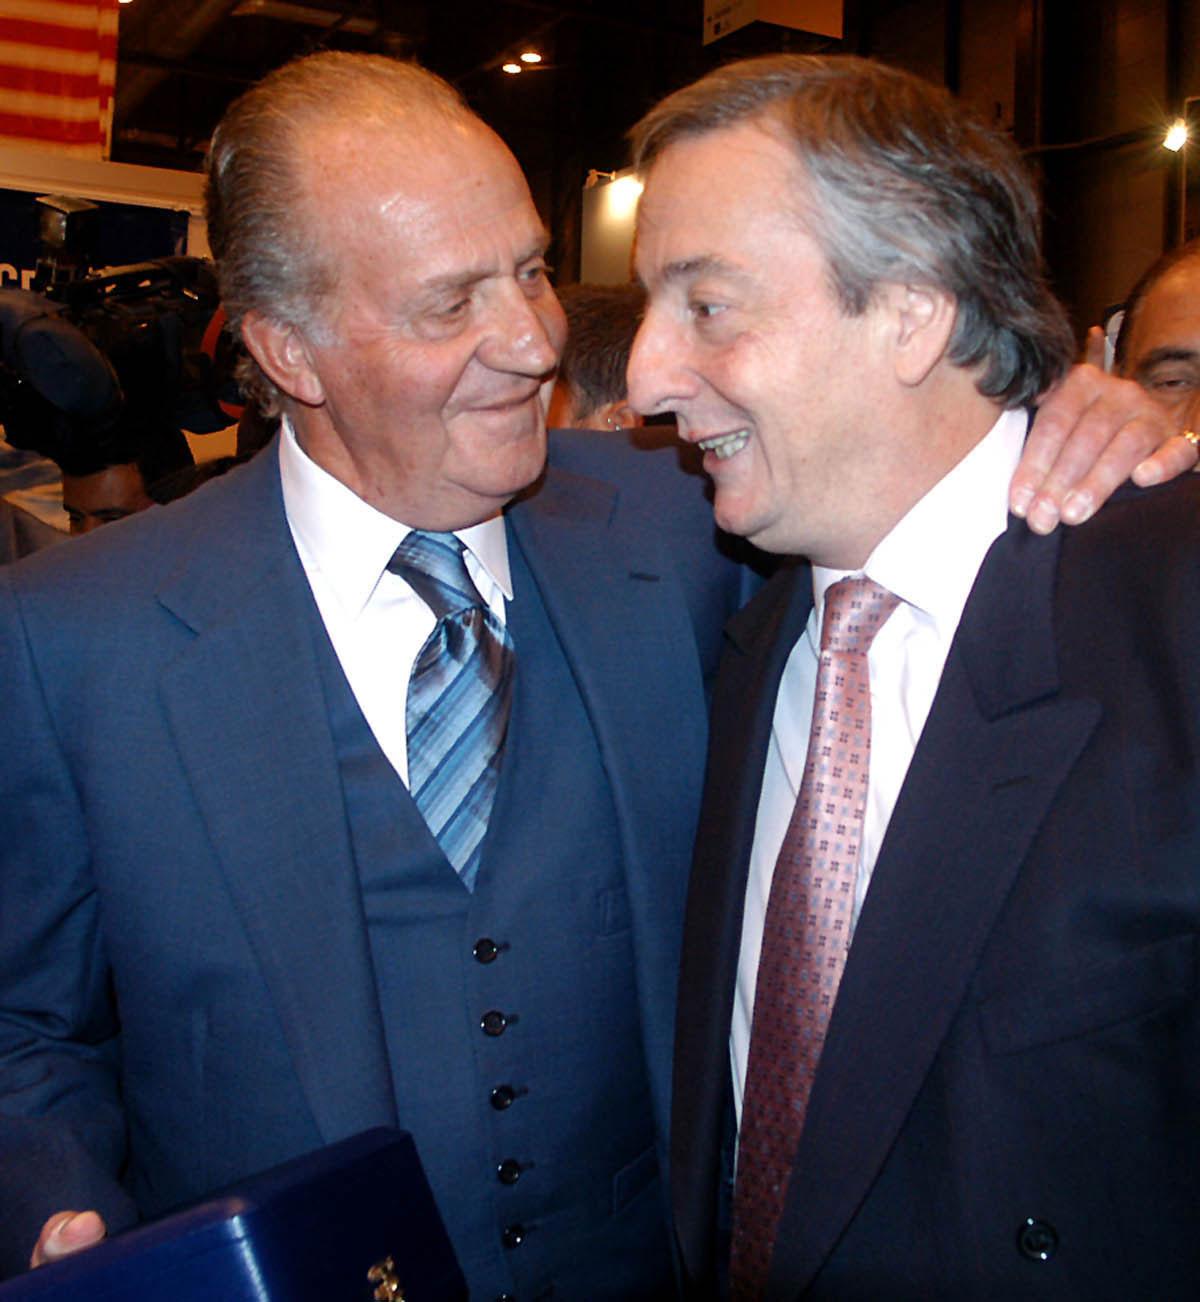 N%C3%A9stor_Kirchner_y_Rey_Juan_Carlos_de_Espa%C3%B1a_-_Enero_2004.jpg